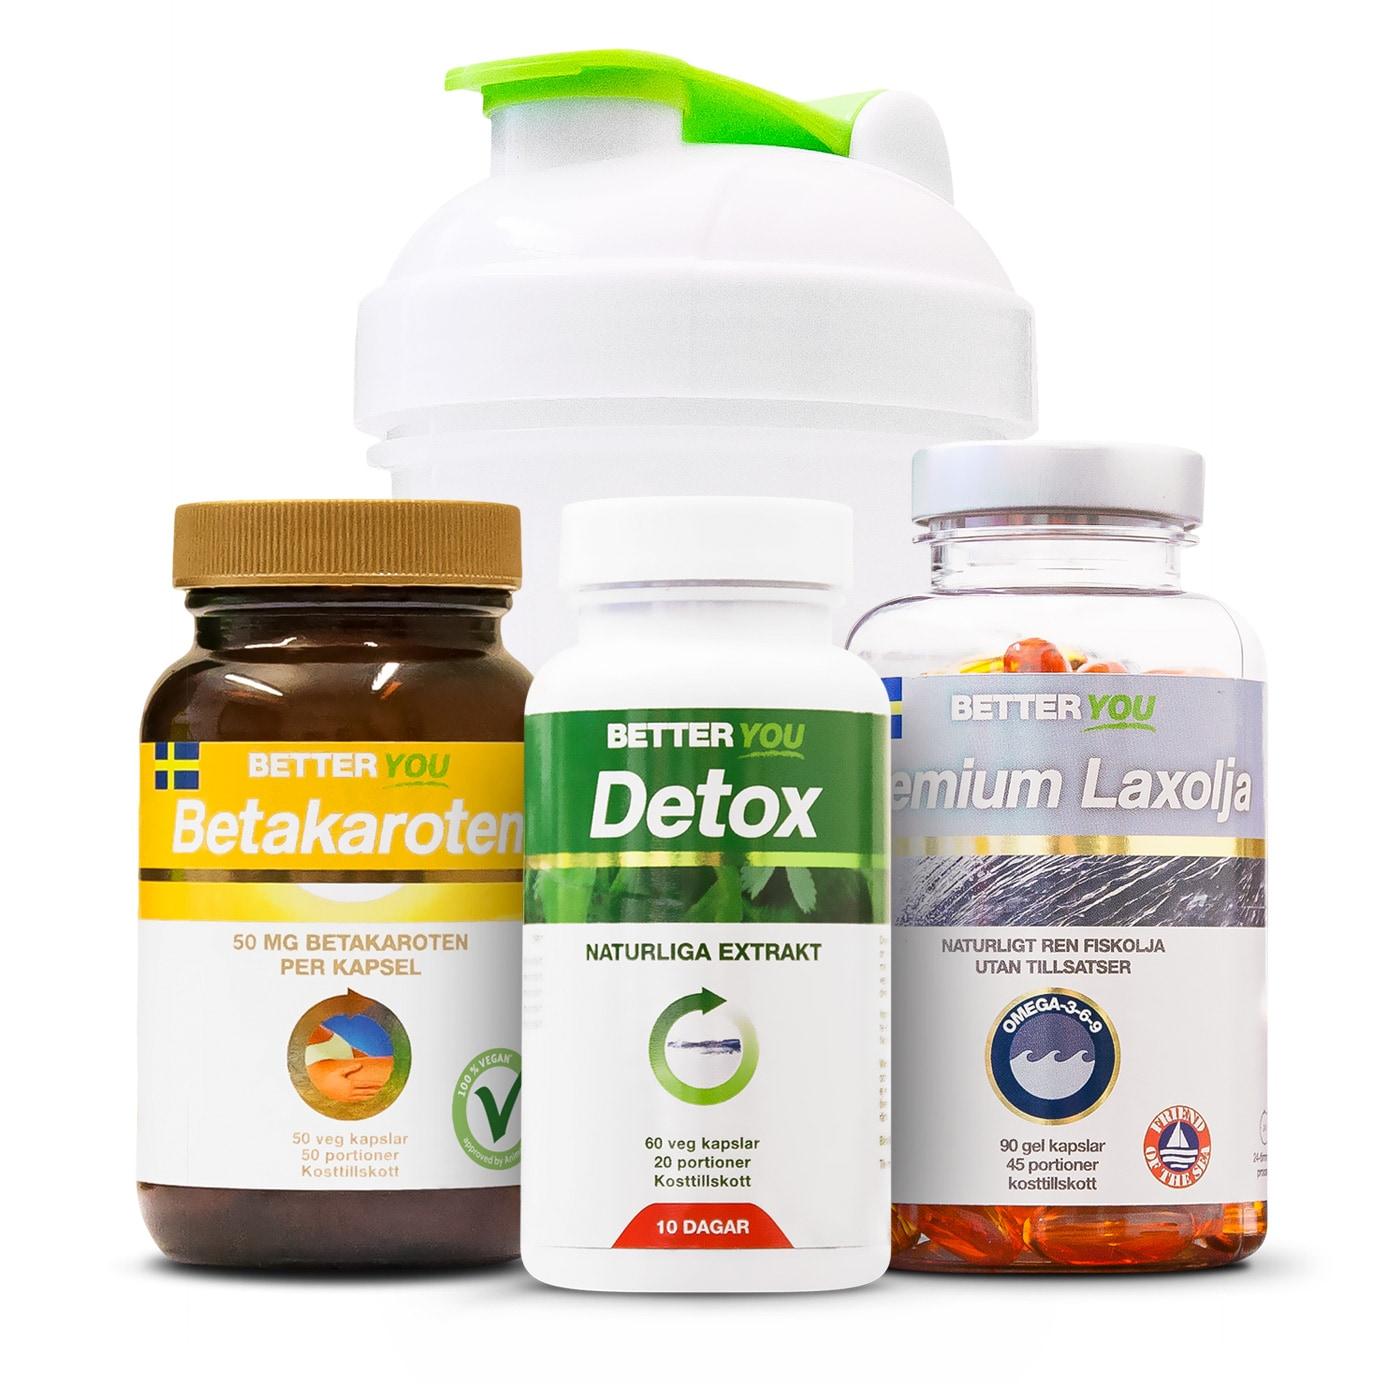 Hud- & Detox paket